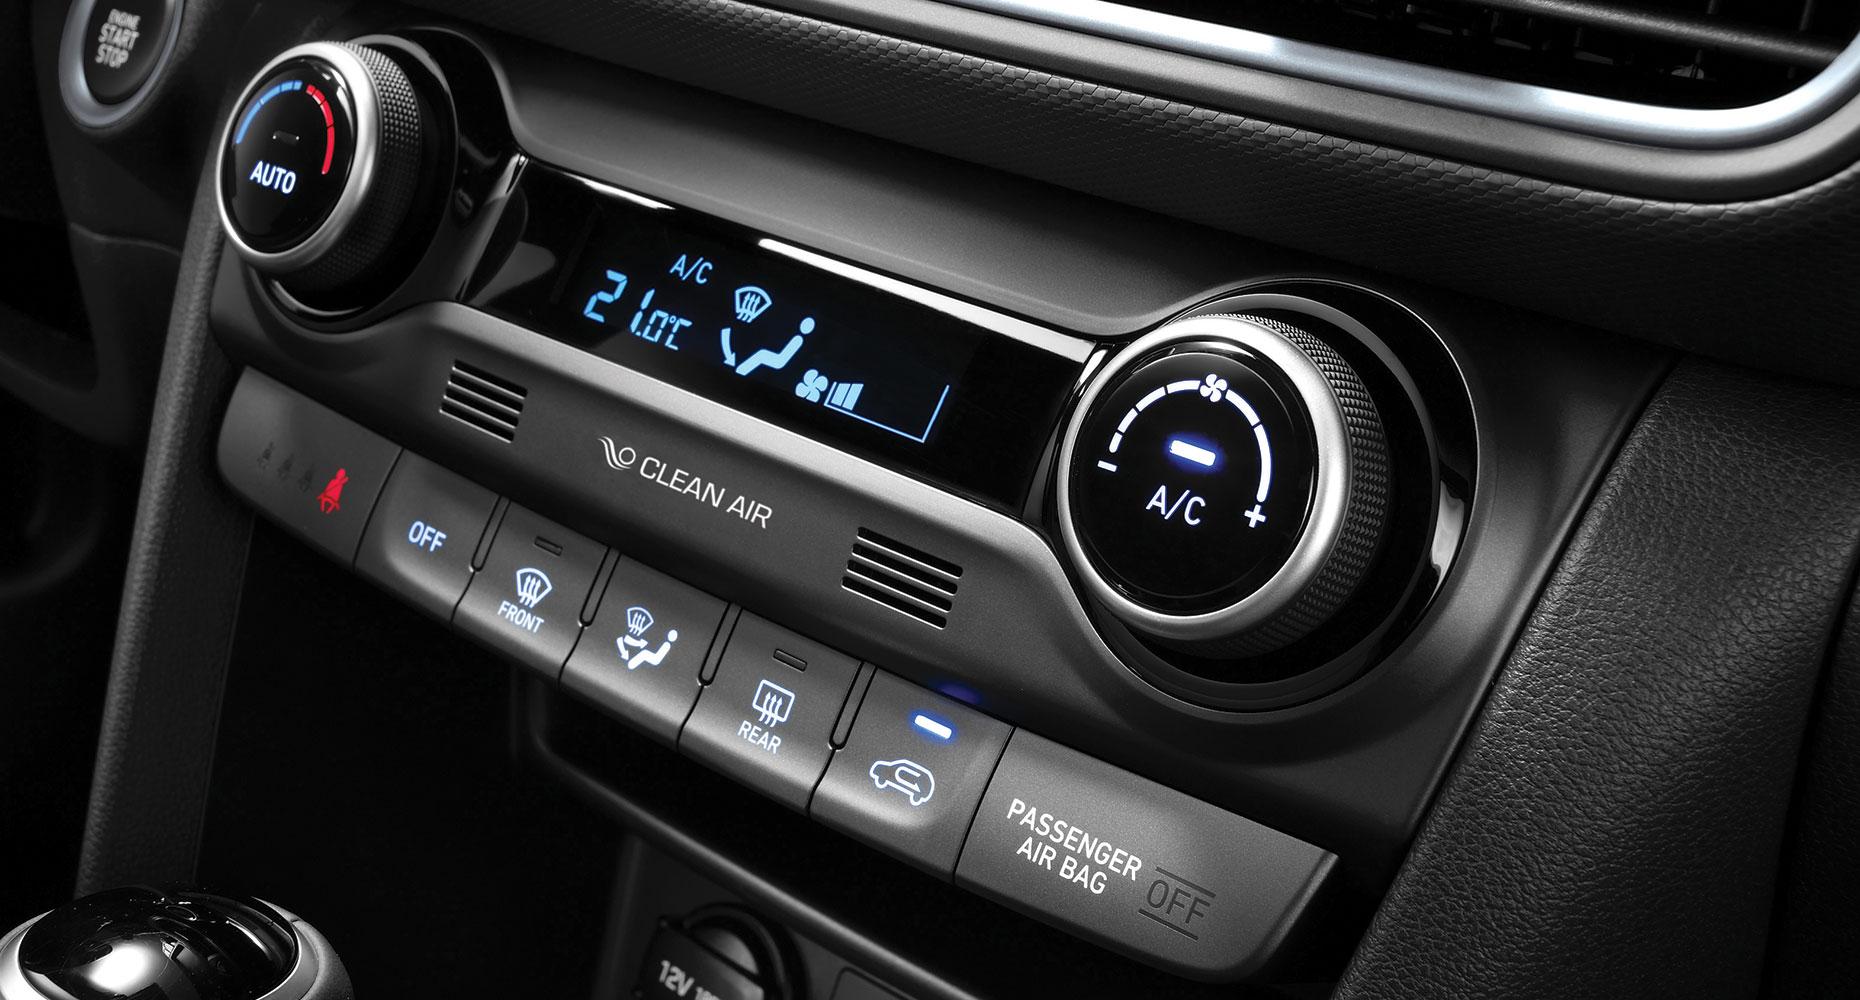 2019 Hyundai KONA | SUV Crossover Utility Vehicle | Hyundai